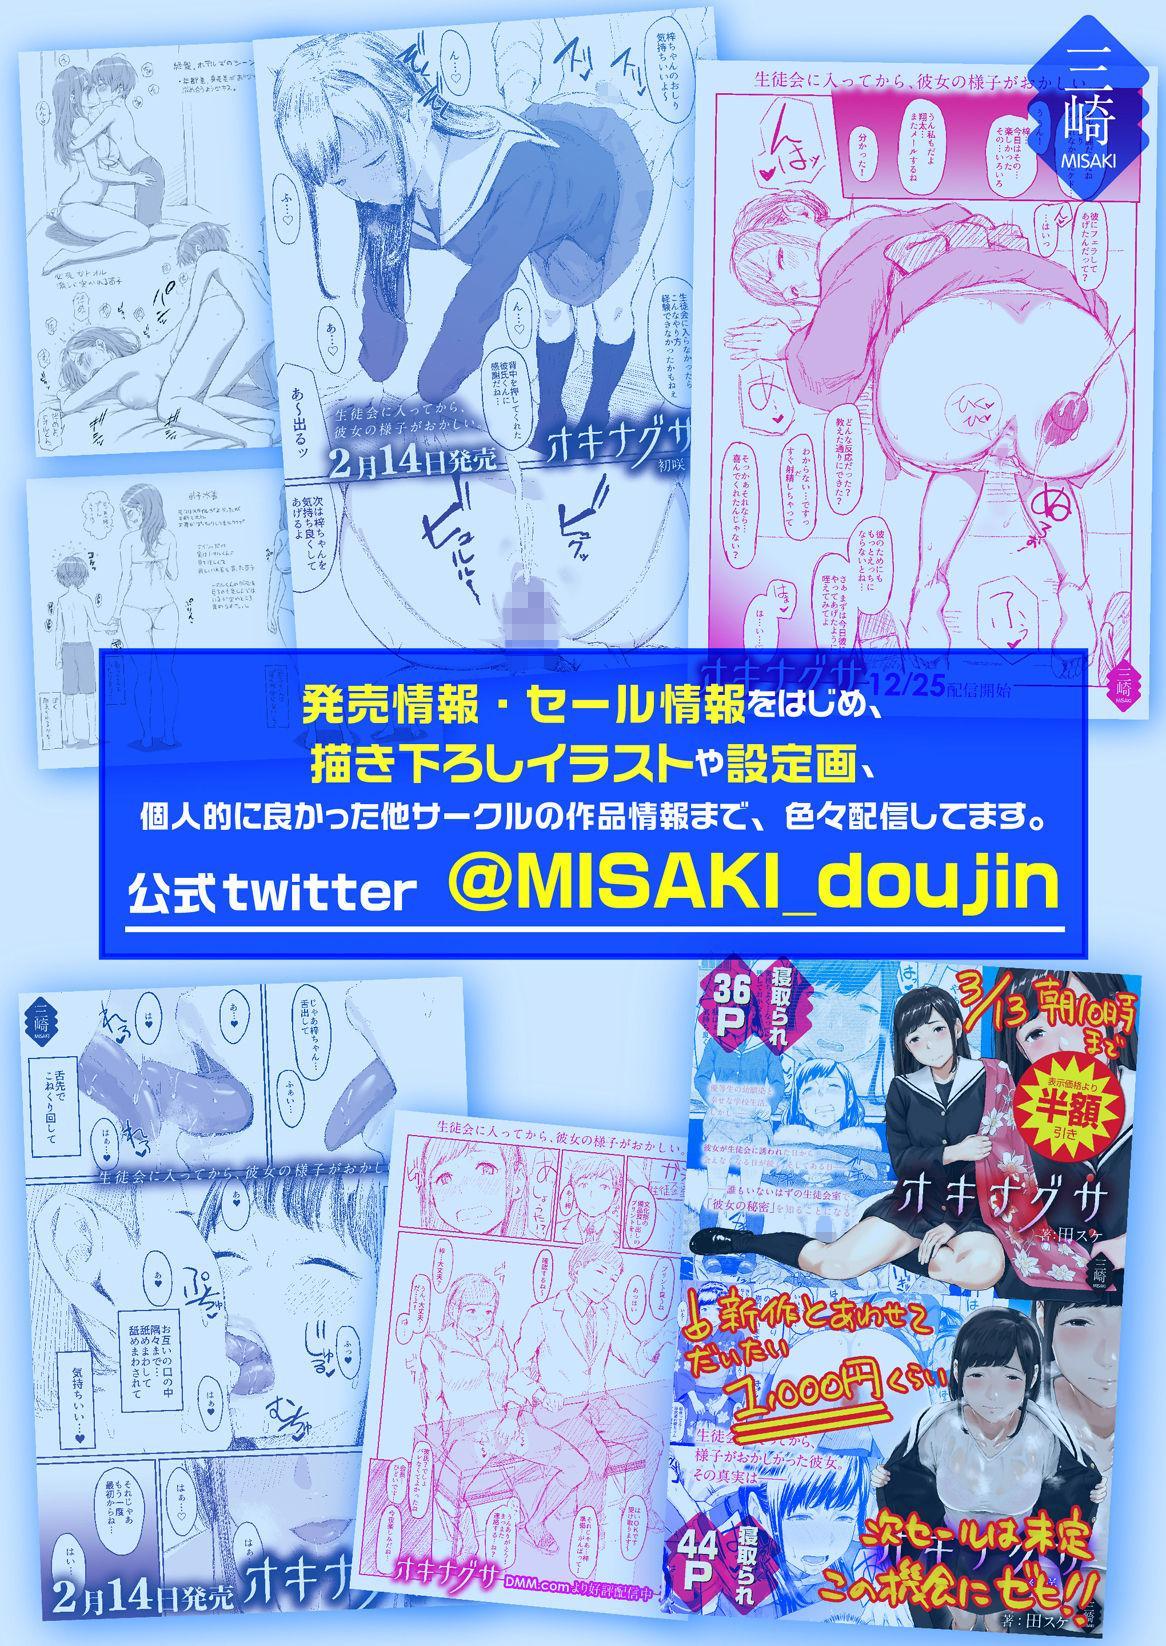 Oppai na Natsuyasumi | The Summer Break of Boobs 51